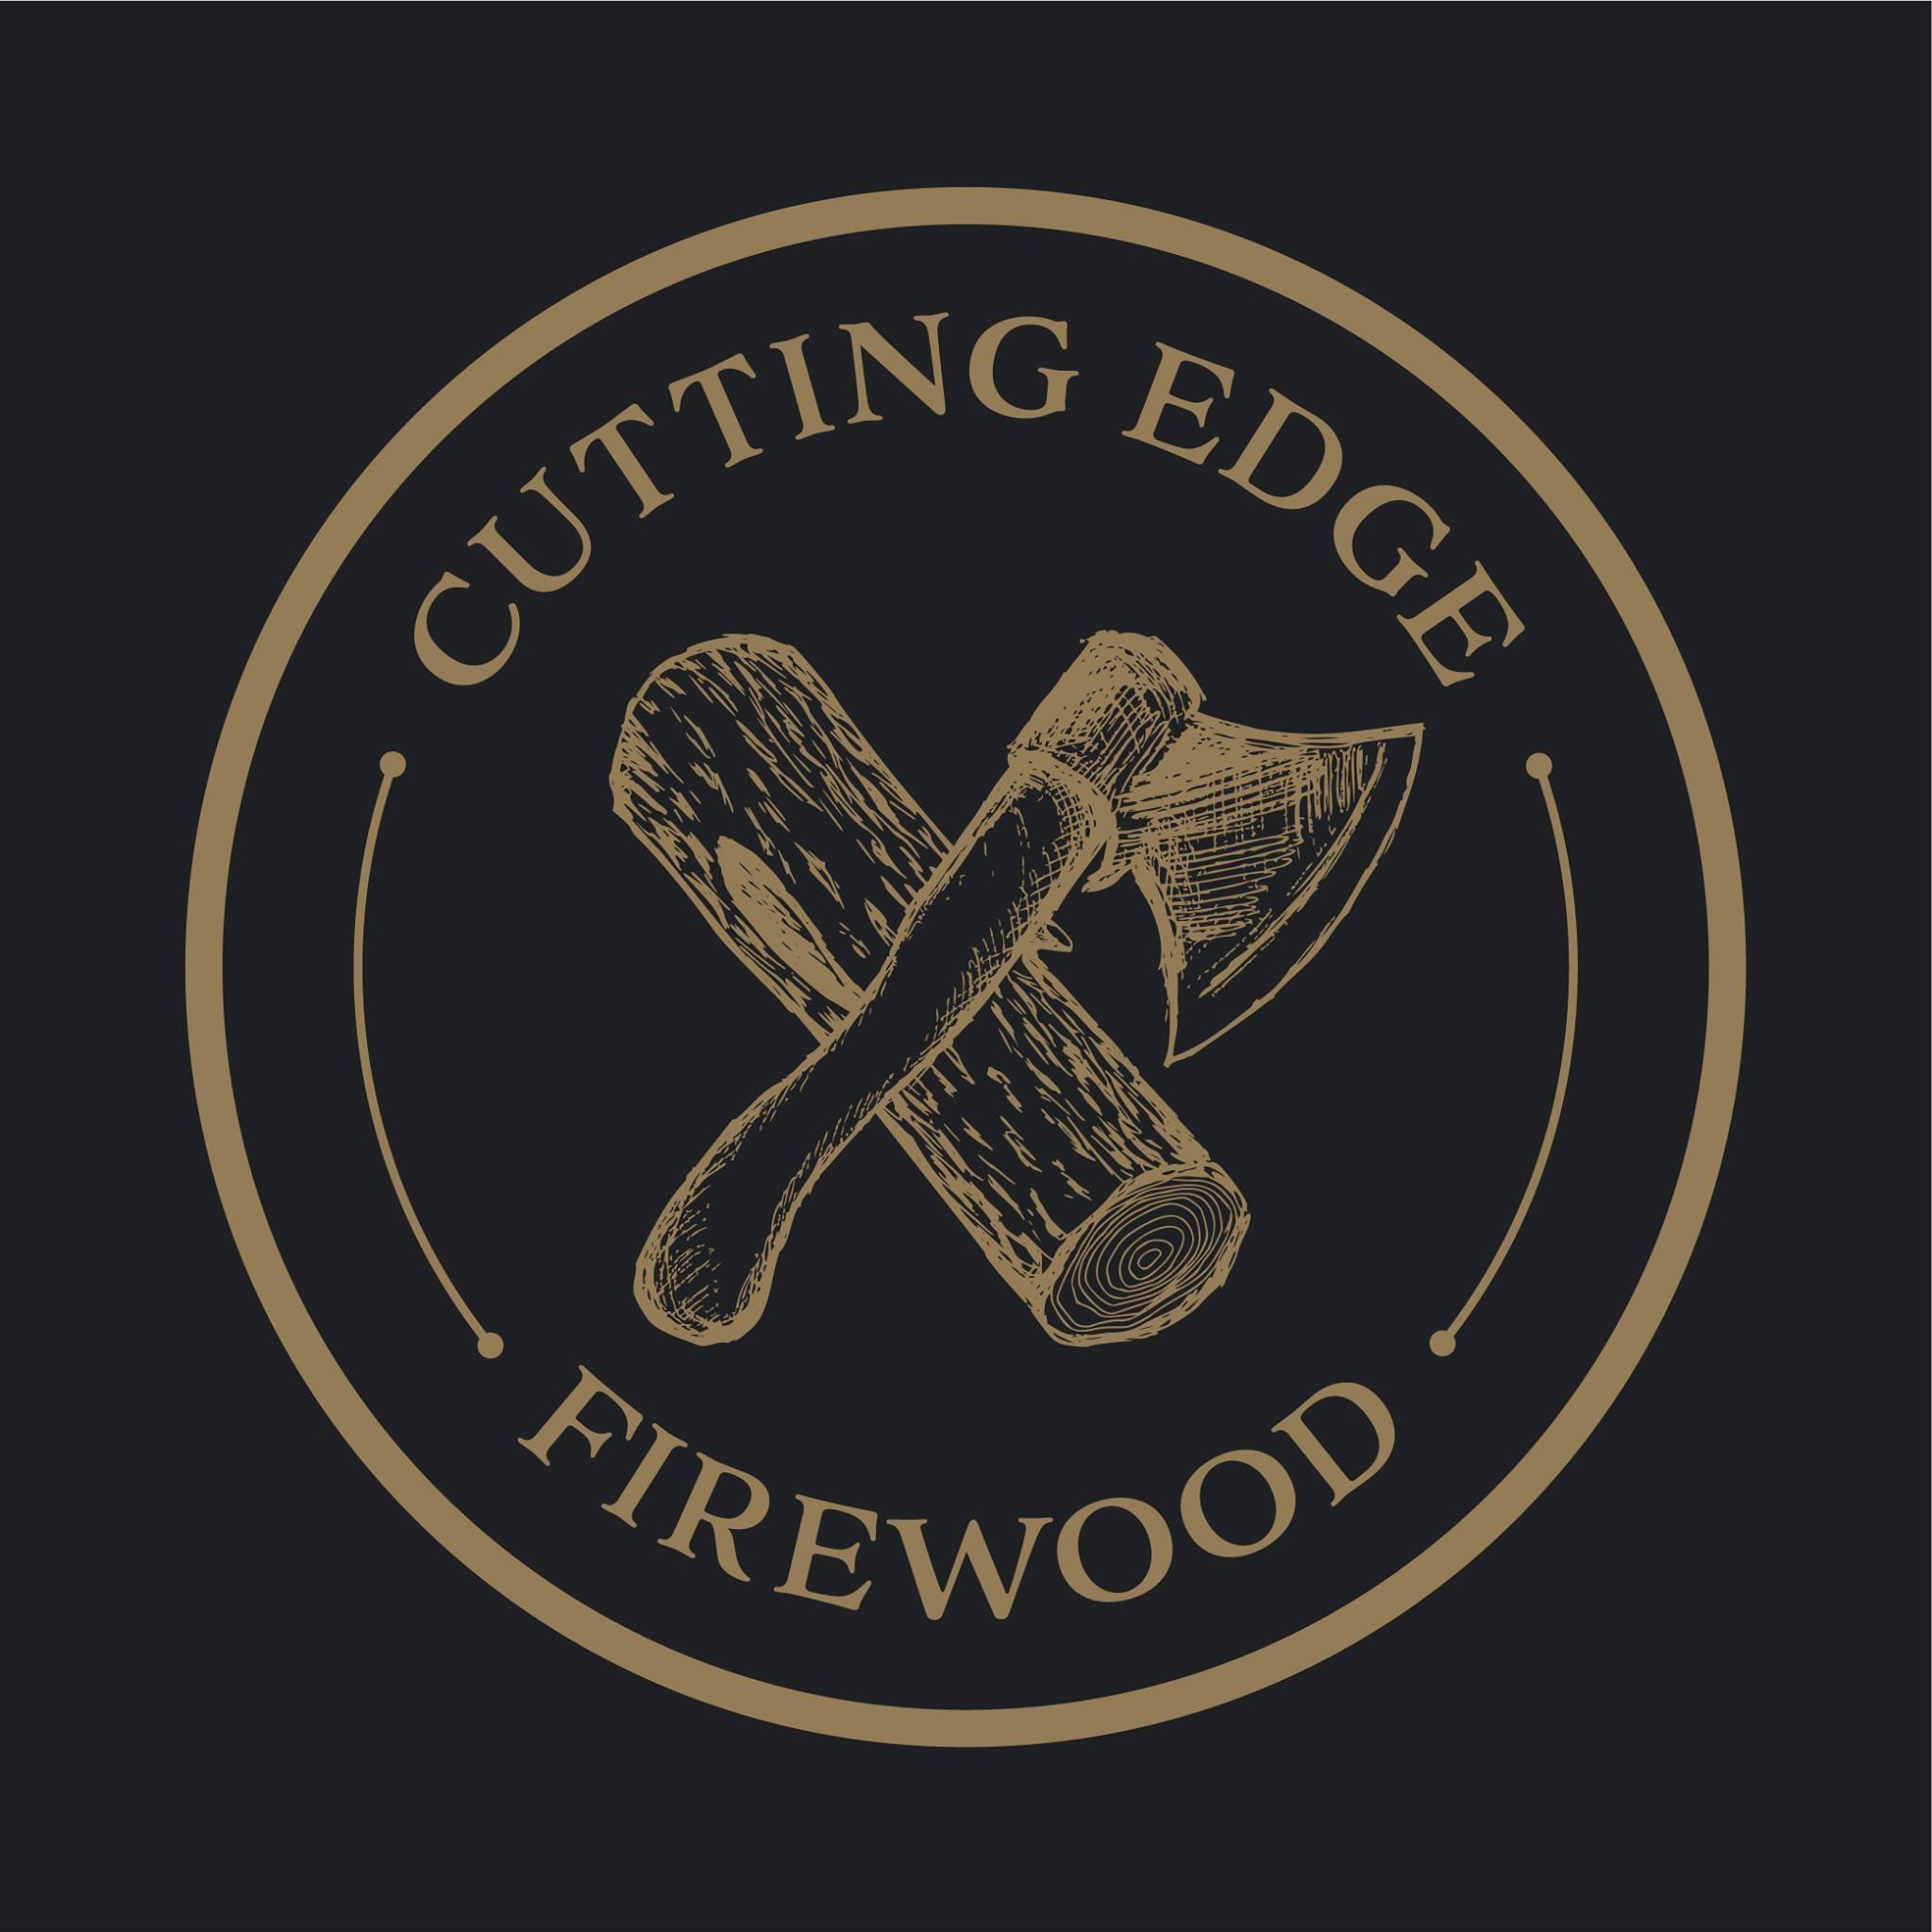 Cutting Edge Firewood